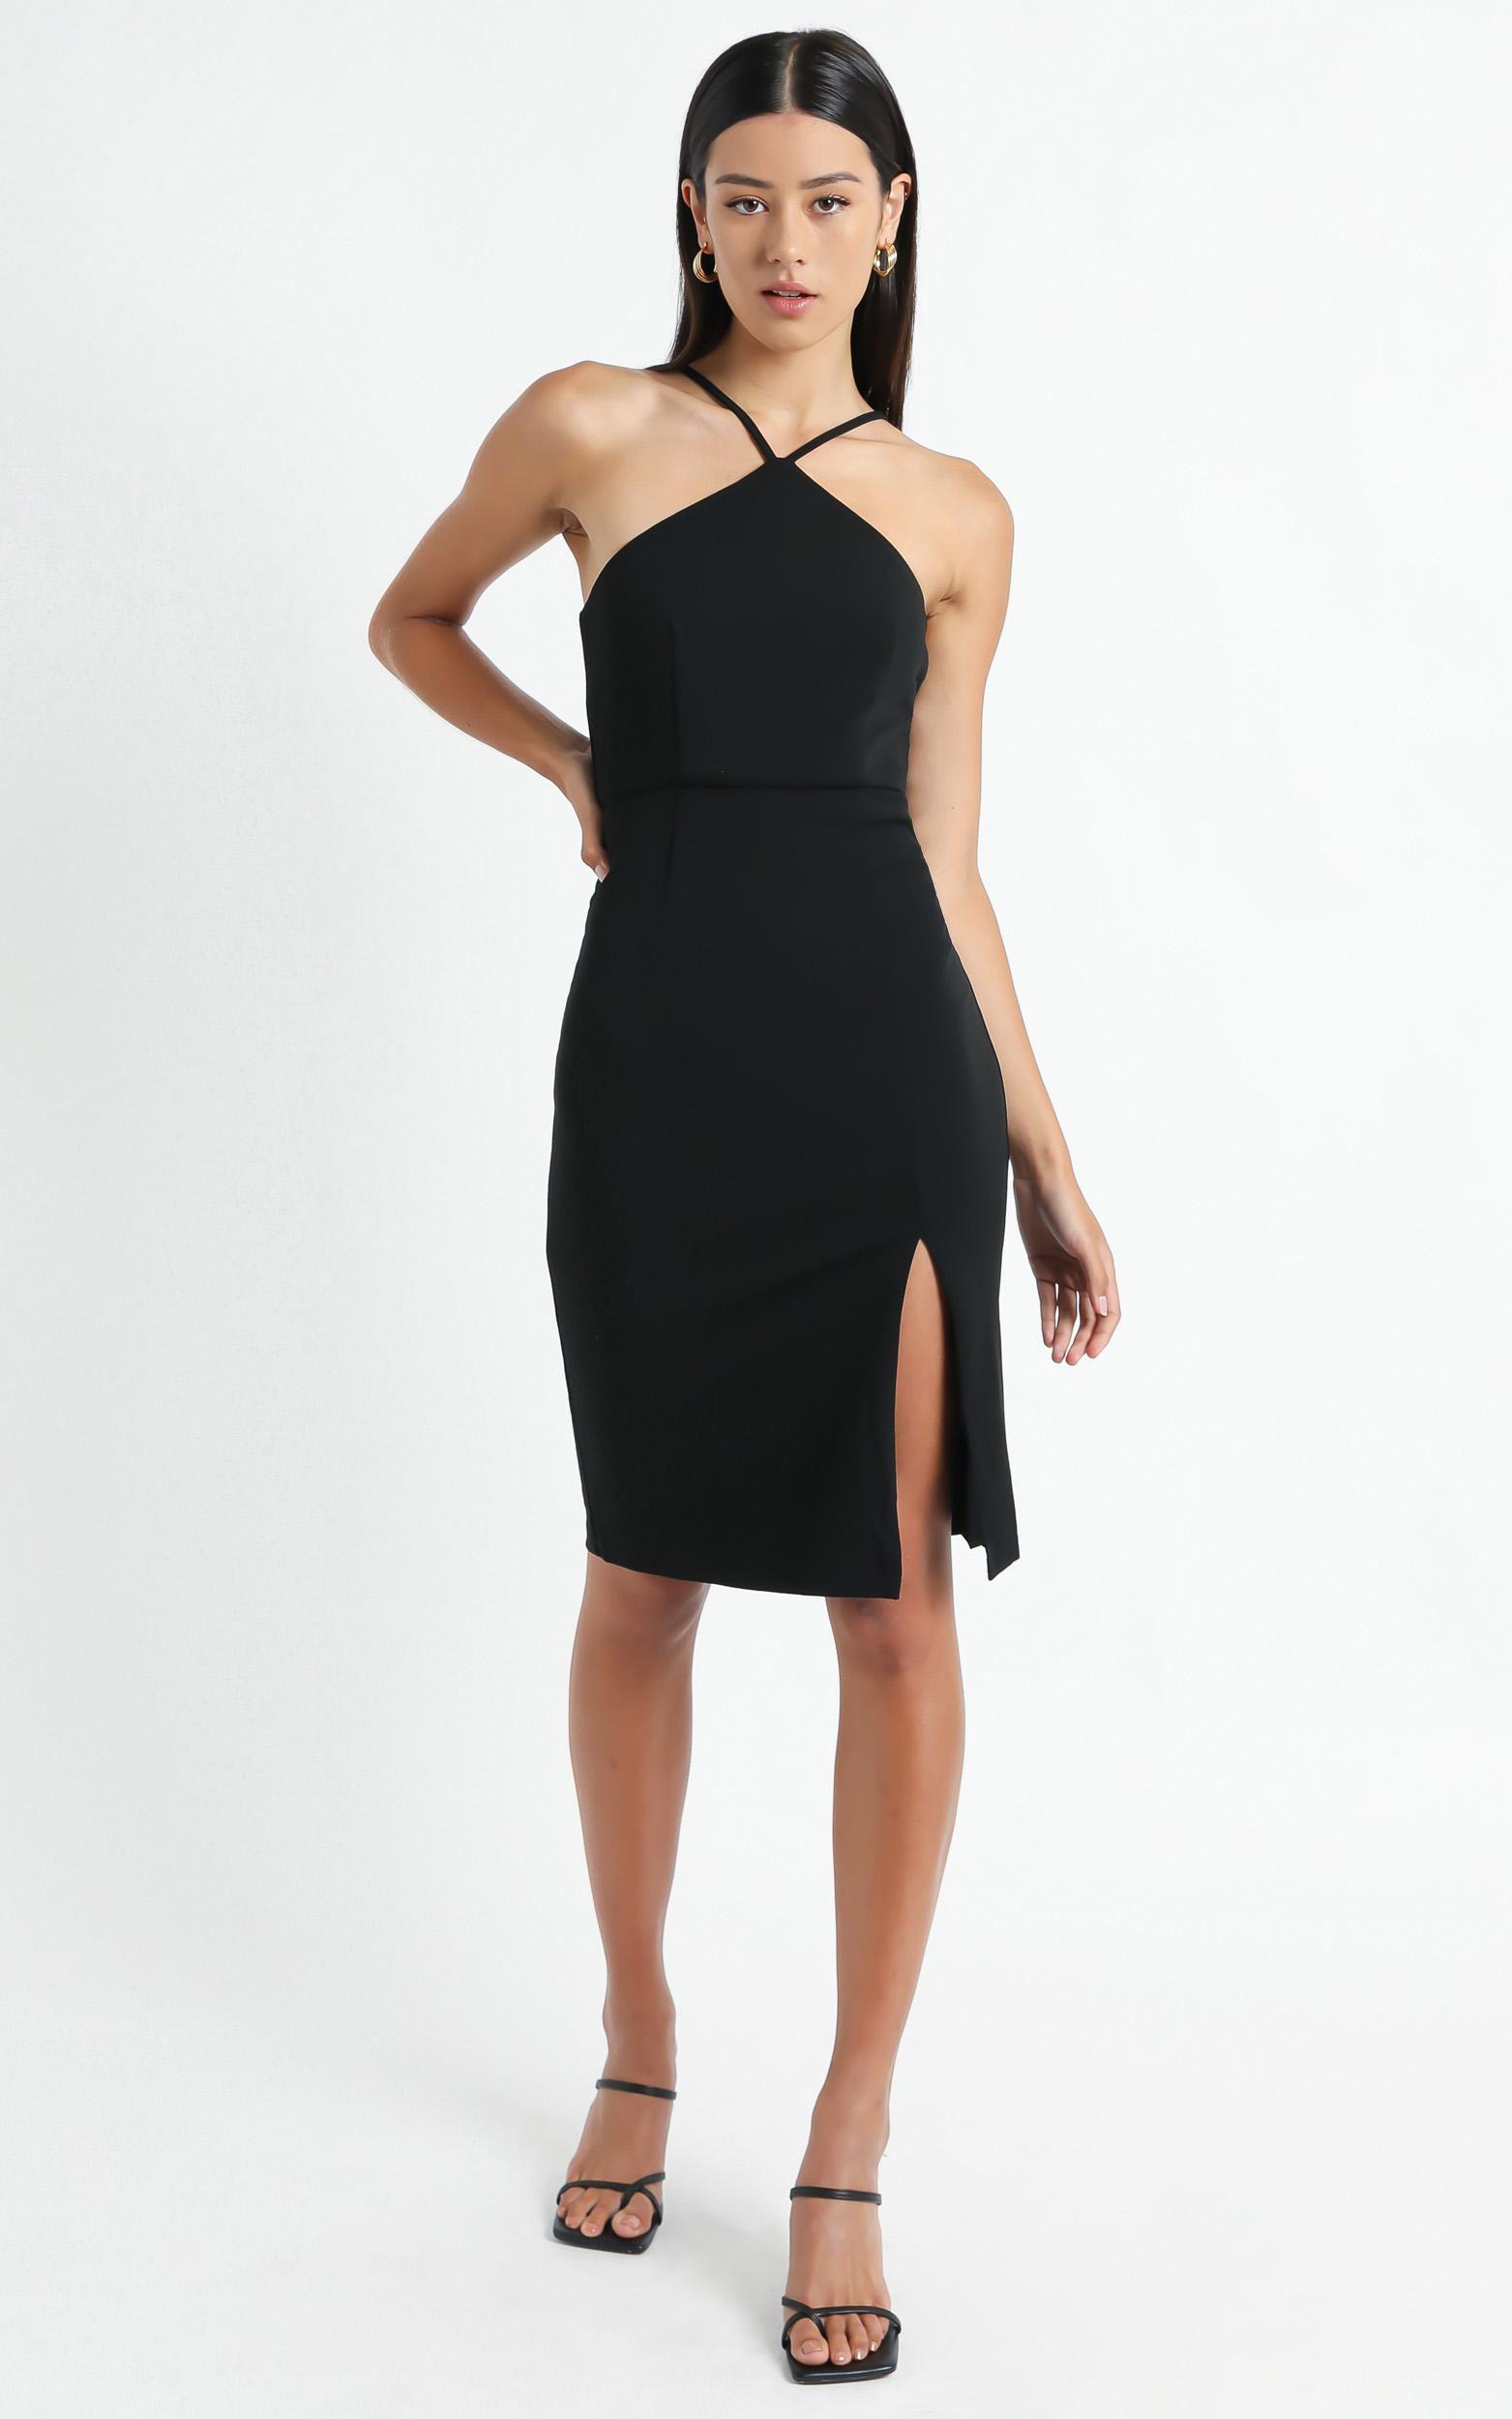 Missed The Point Dress In Black - 12 (L), Black, hi-res image number null